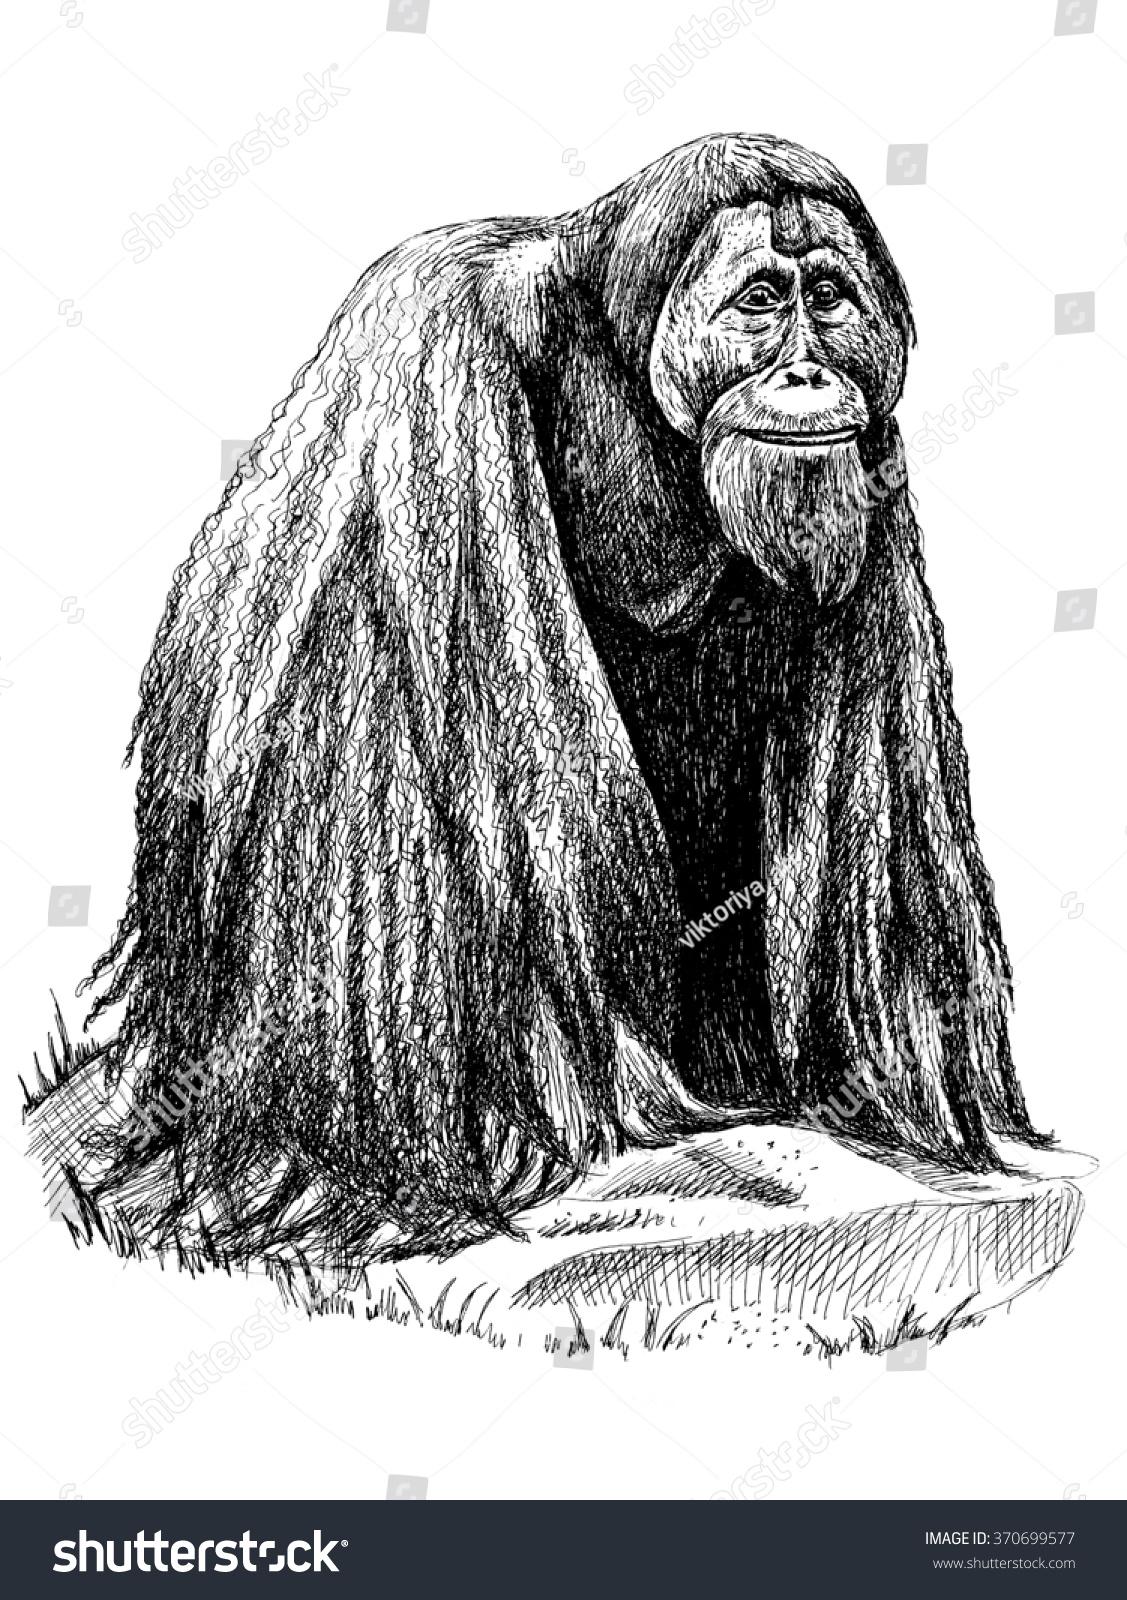 Uncategorized Orangutan Drawing monkey orangutan drawing stock illustration 370699577 shutterstock drawing